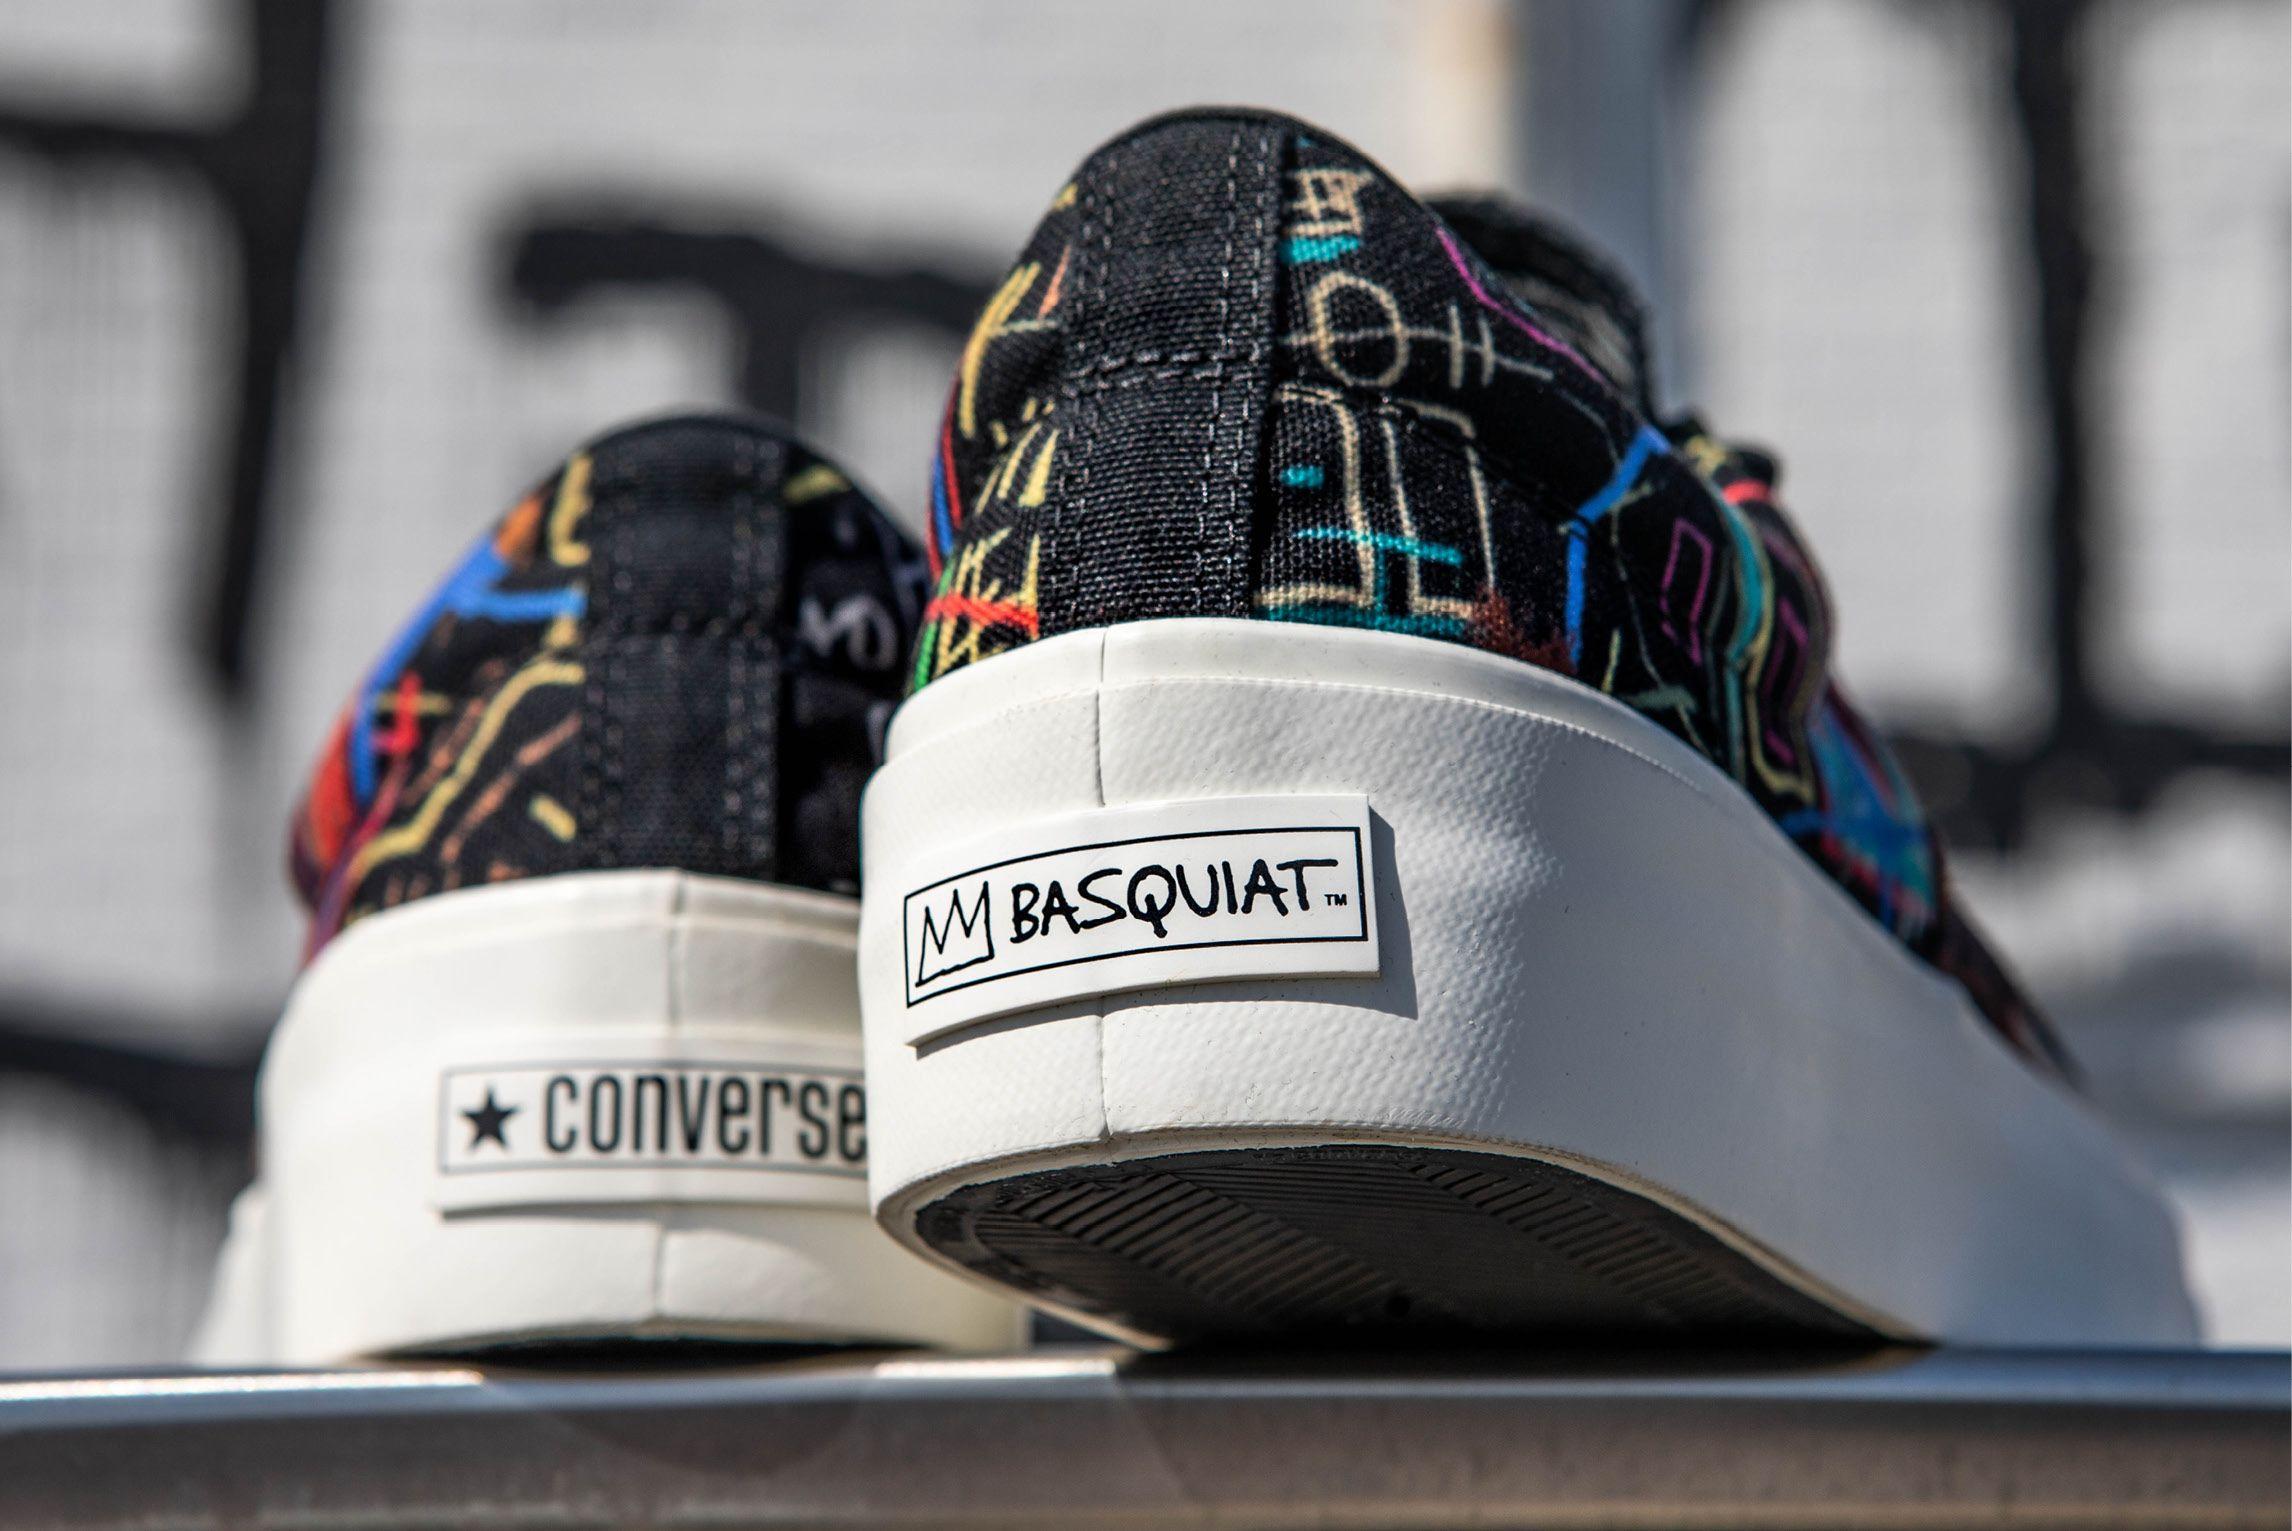 Jean-Michel Basquiat x Converse Skidgrip